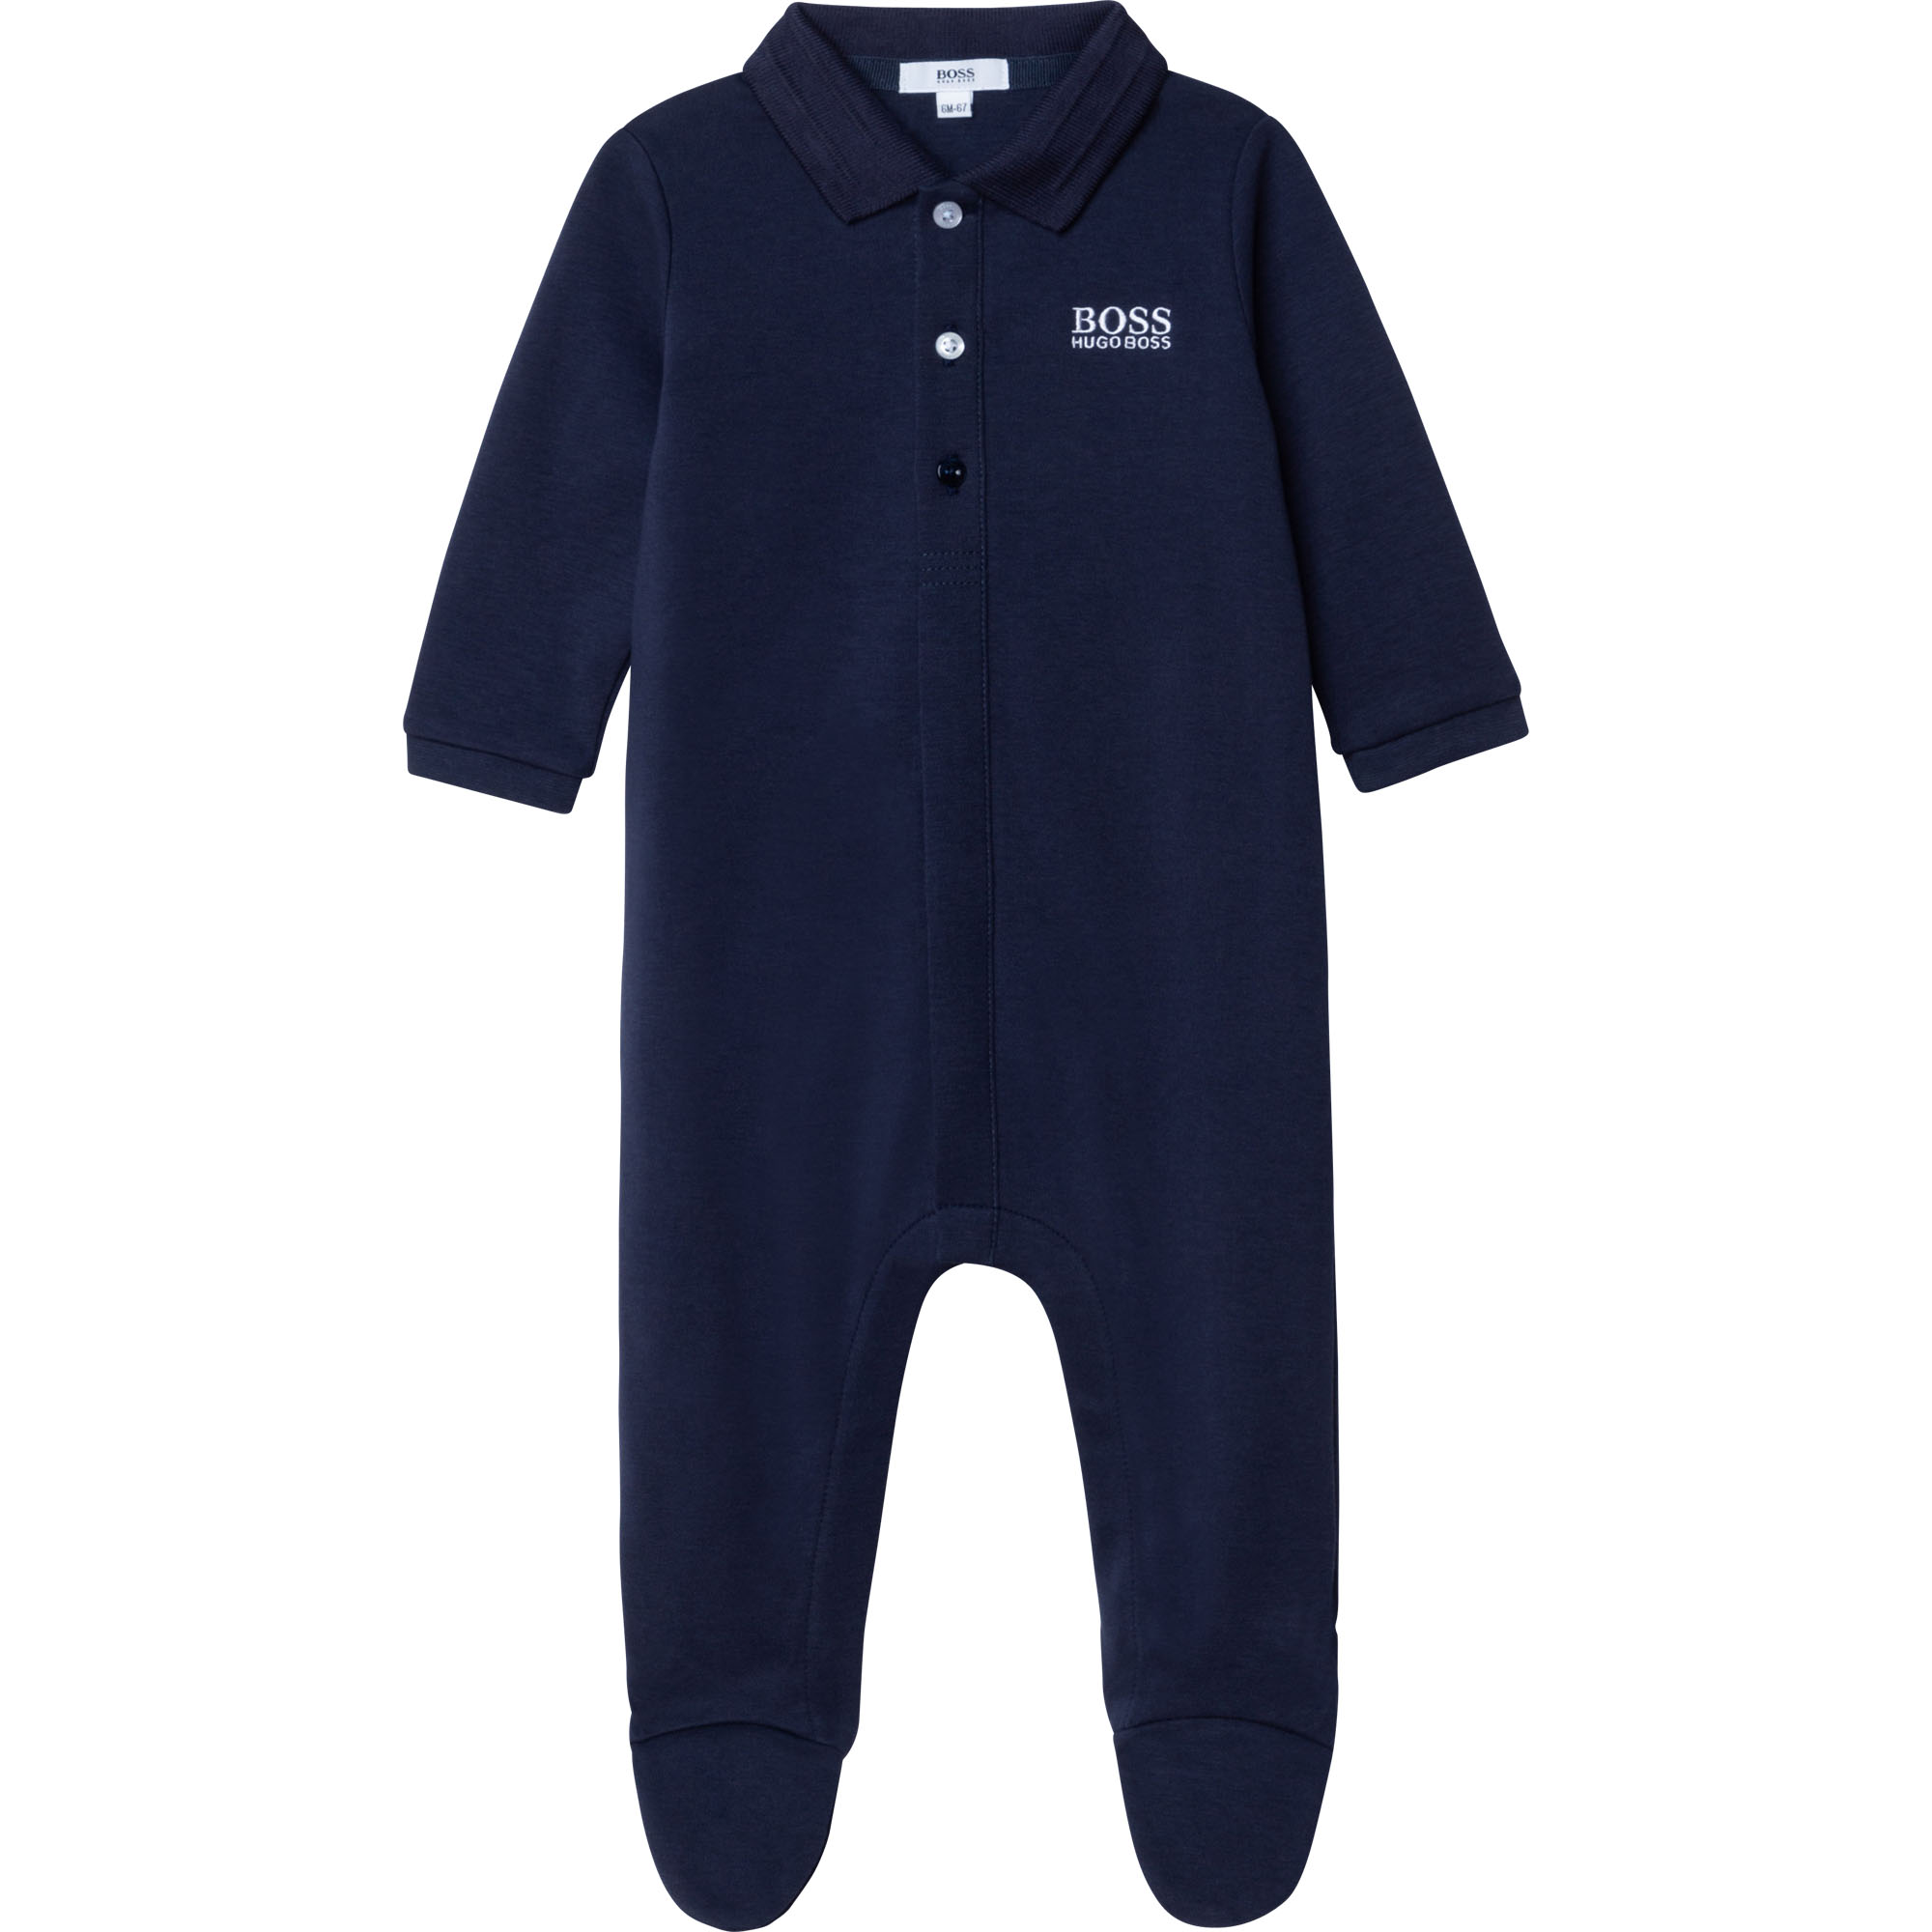 Pyjama en interlock coton BOSS BEBE COUCHE GARCON Bleu